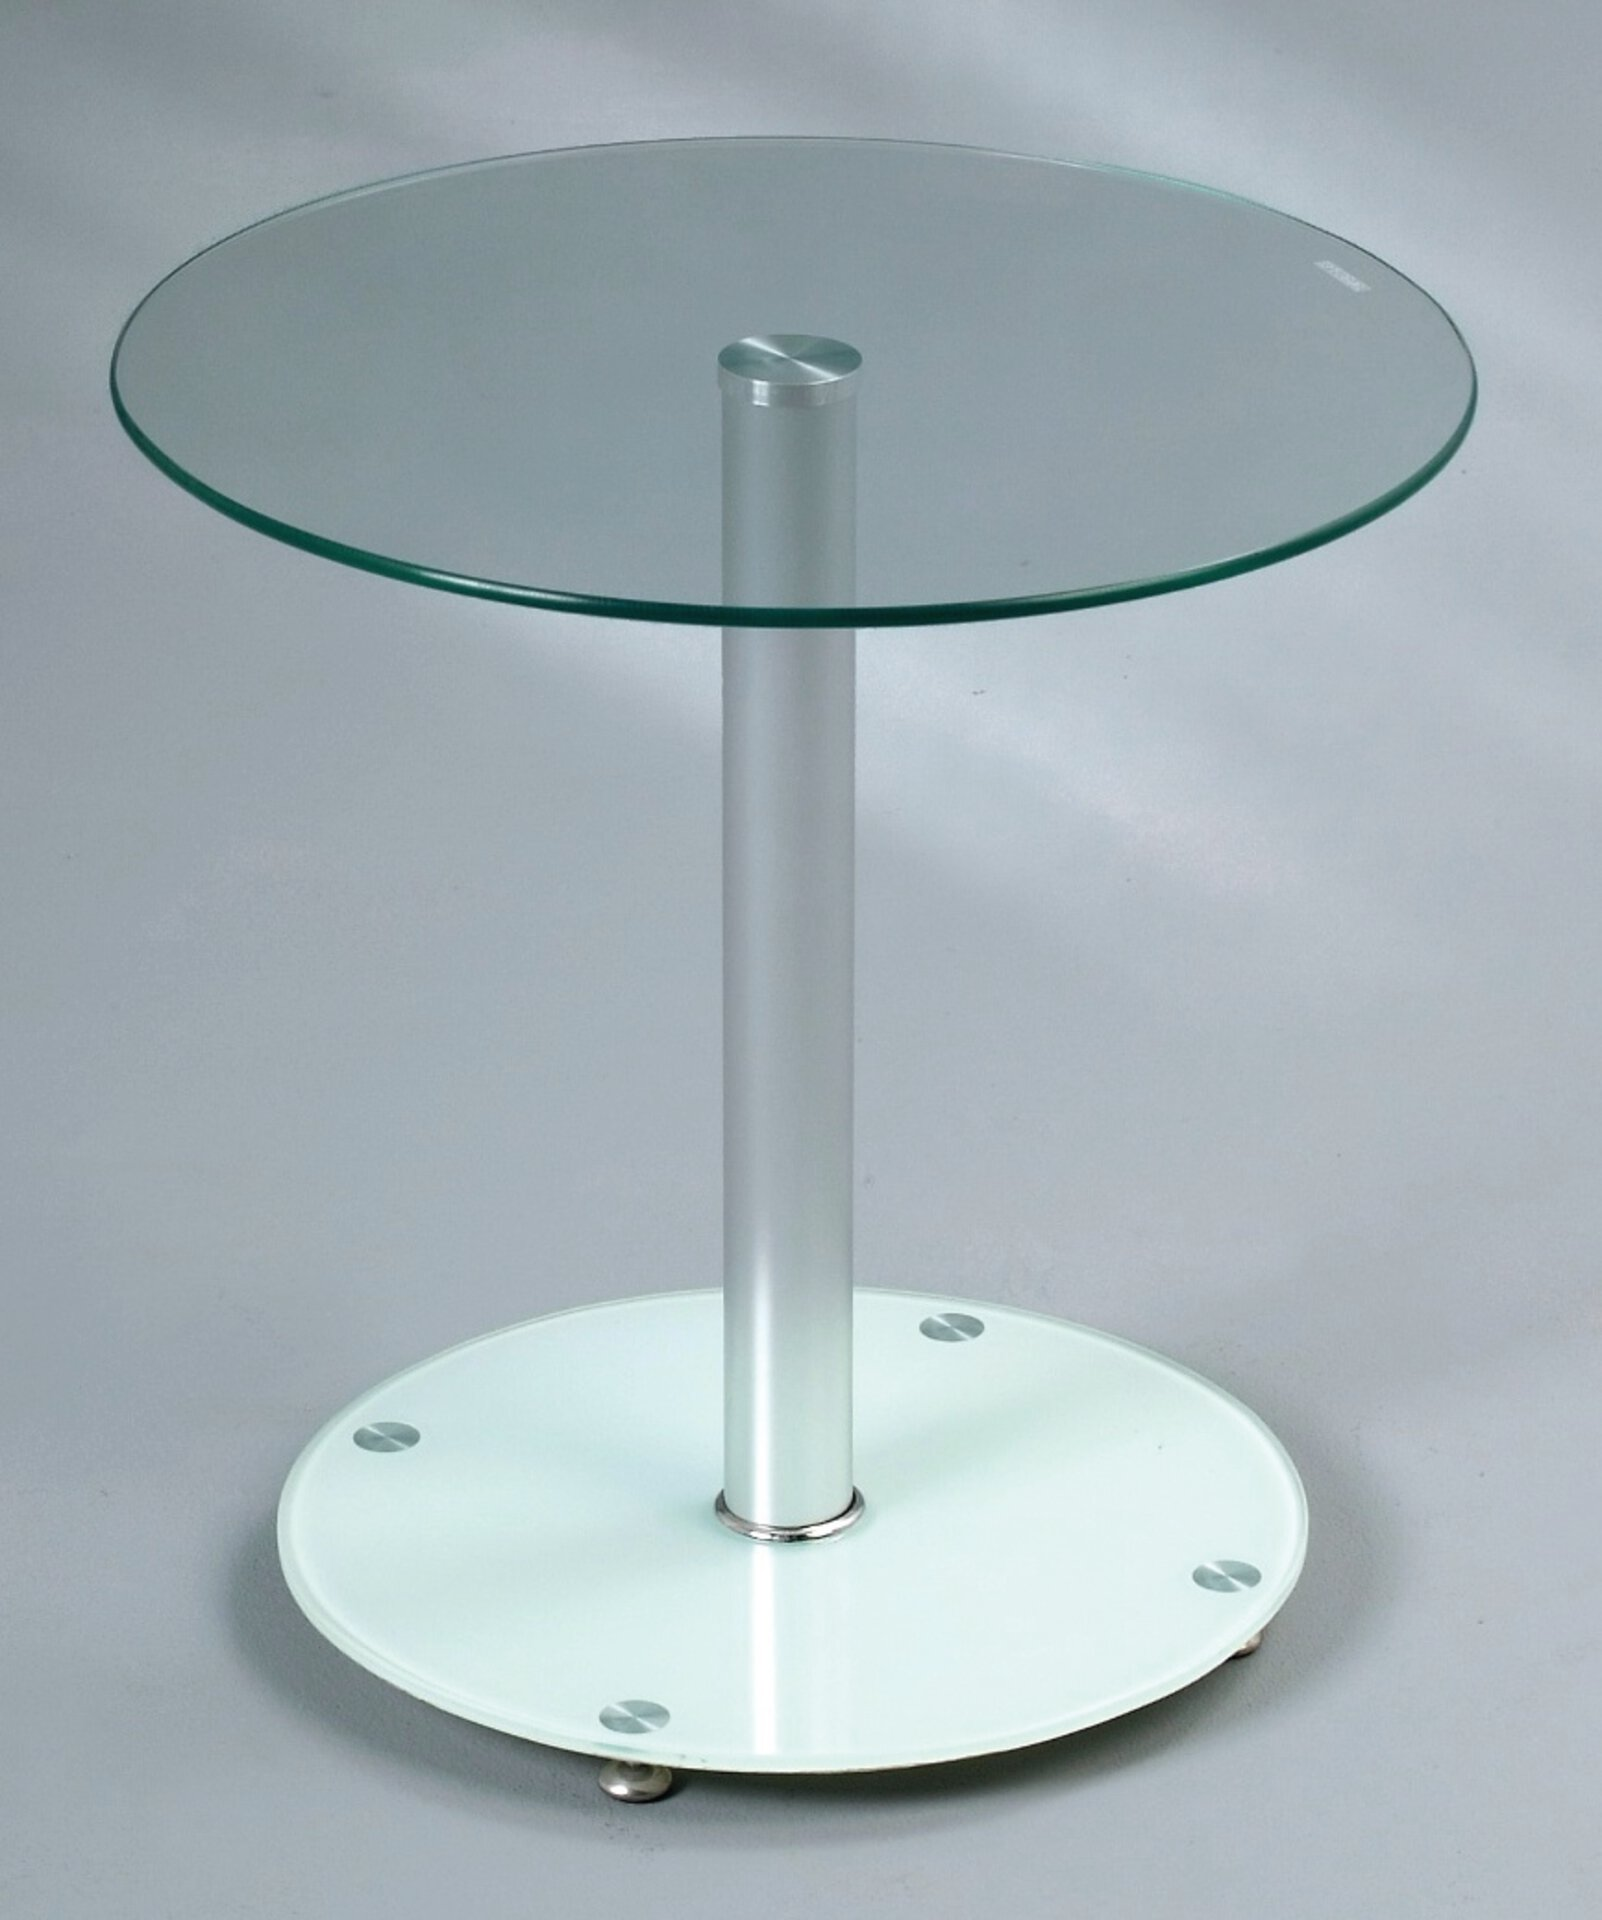 Beistelltisch ANNA M2 Kollektion Metall weiß 50 x 50 x 50 cm